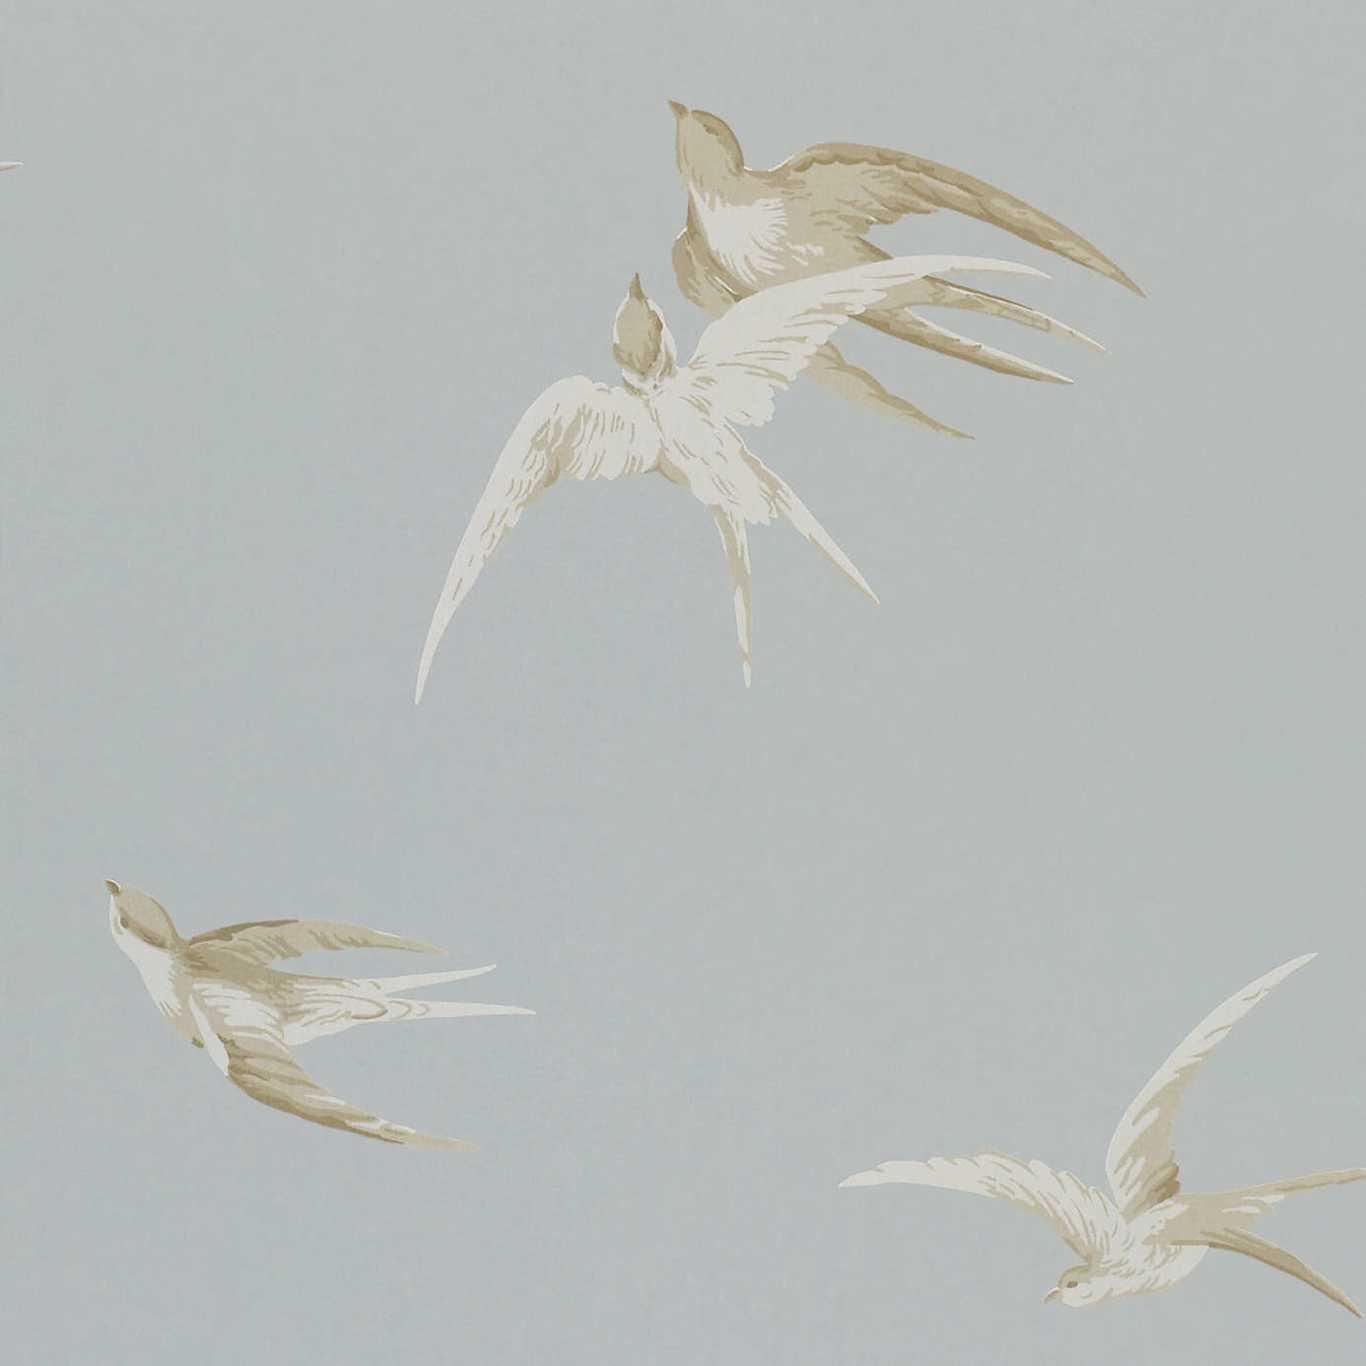 Swallows by SAN